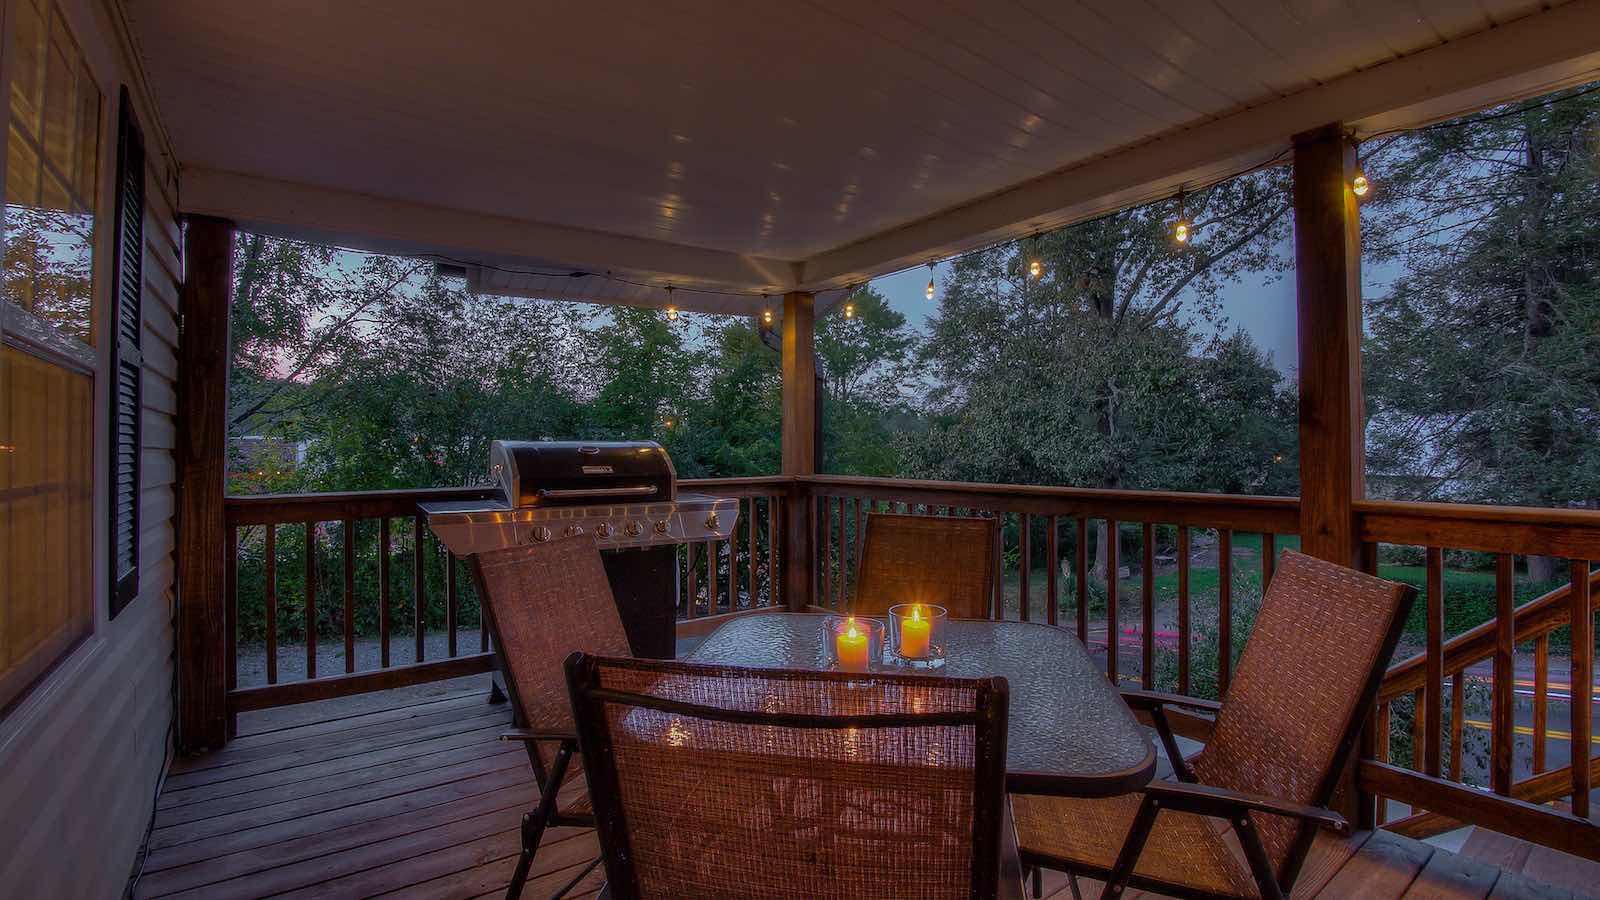 Bungalow Cabin Part - 44: Mountain Top Cabin Rentals